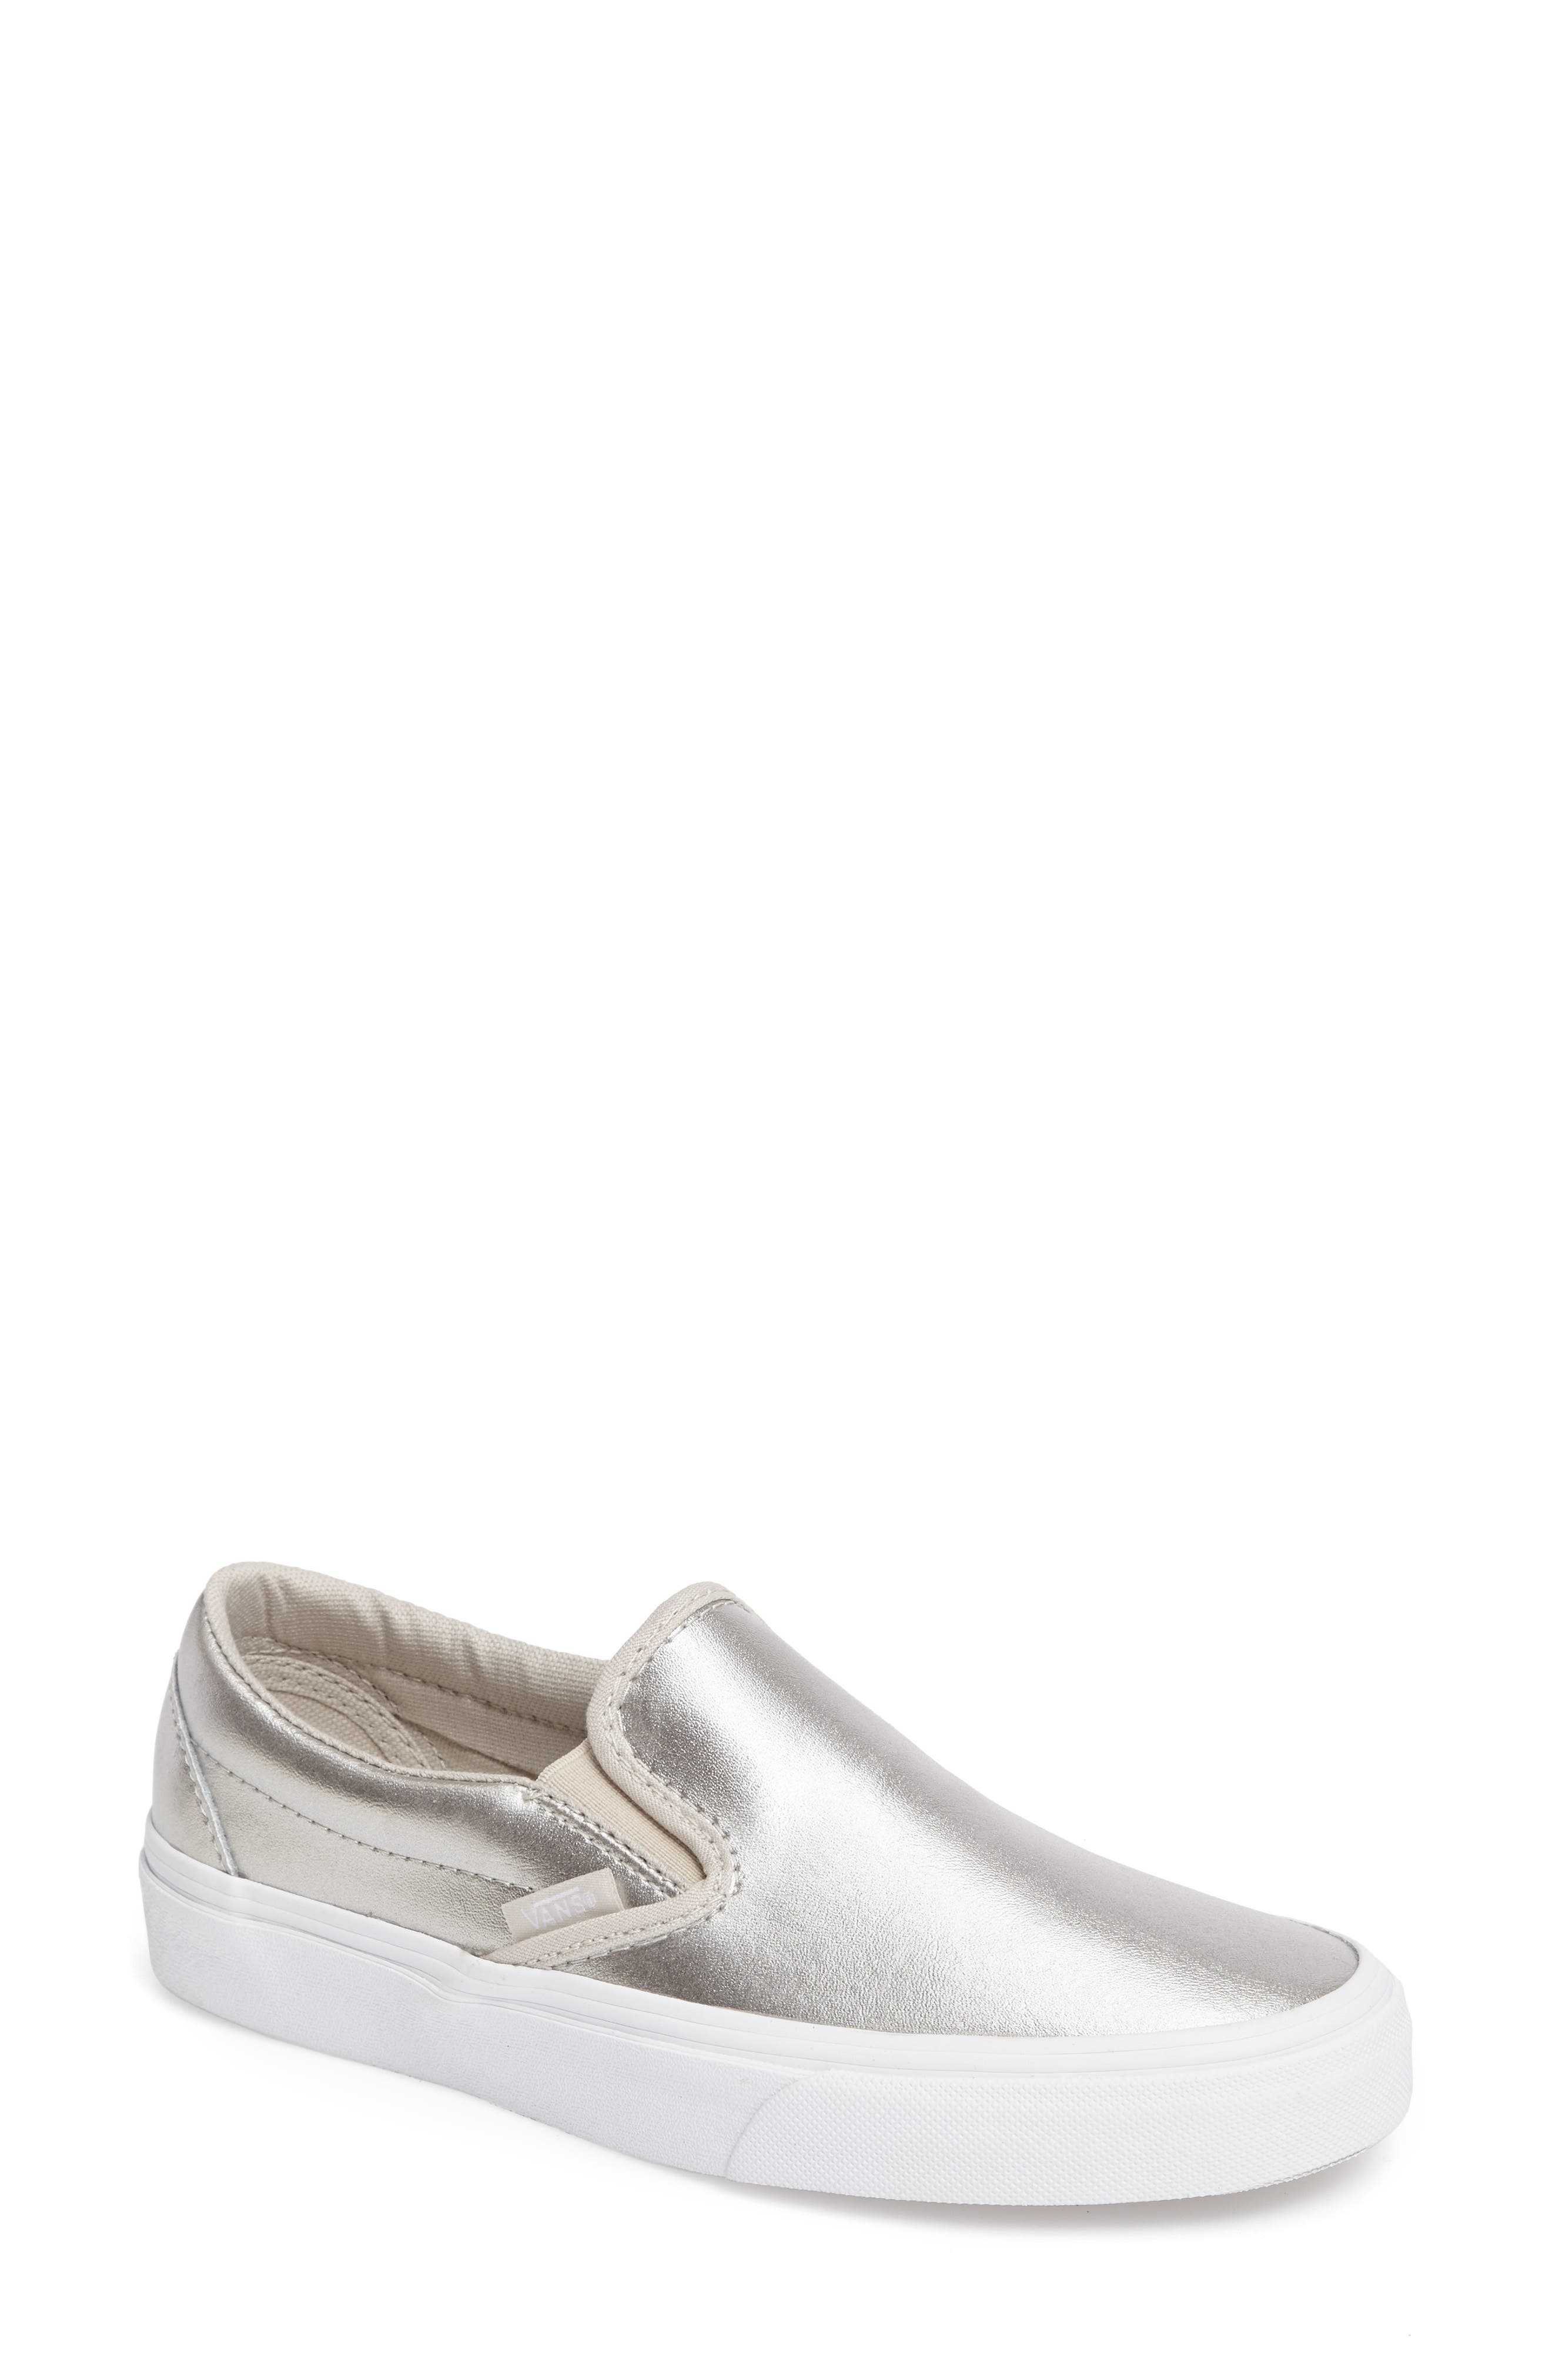 ,                             Classic Slip-On Sneaker,                             Main thumbnail 296, color,                             043